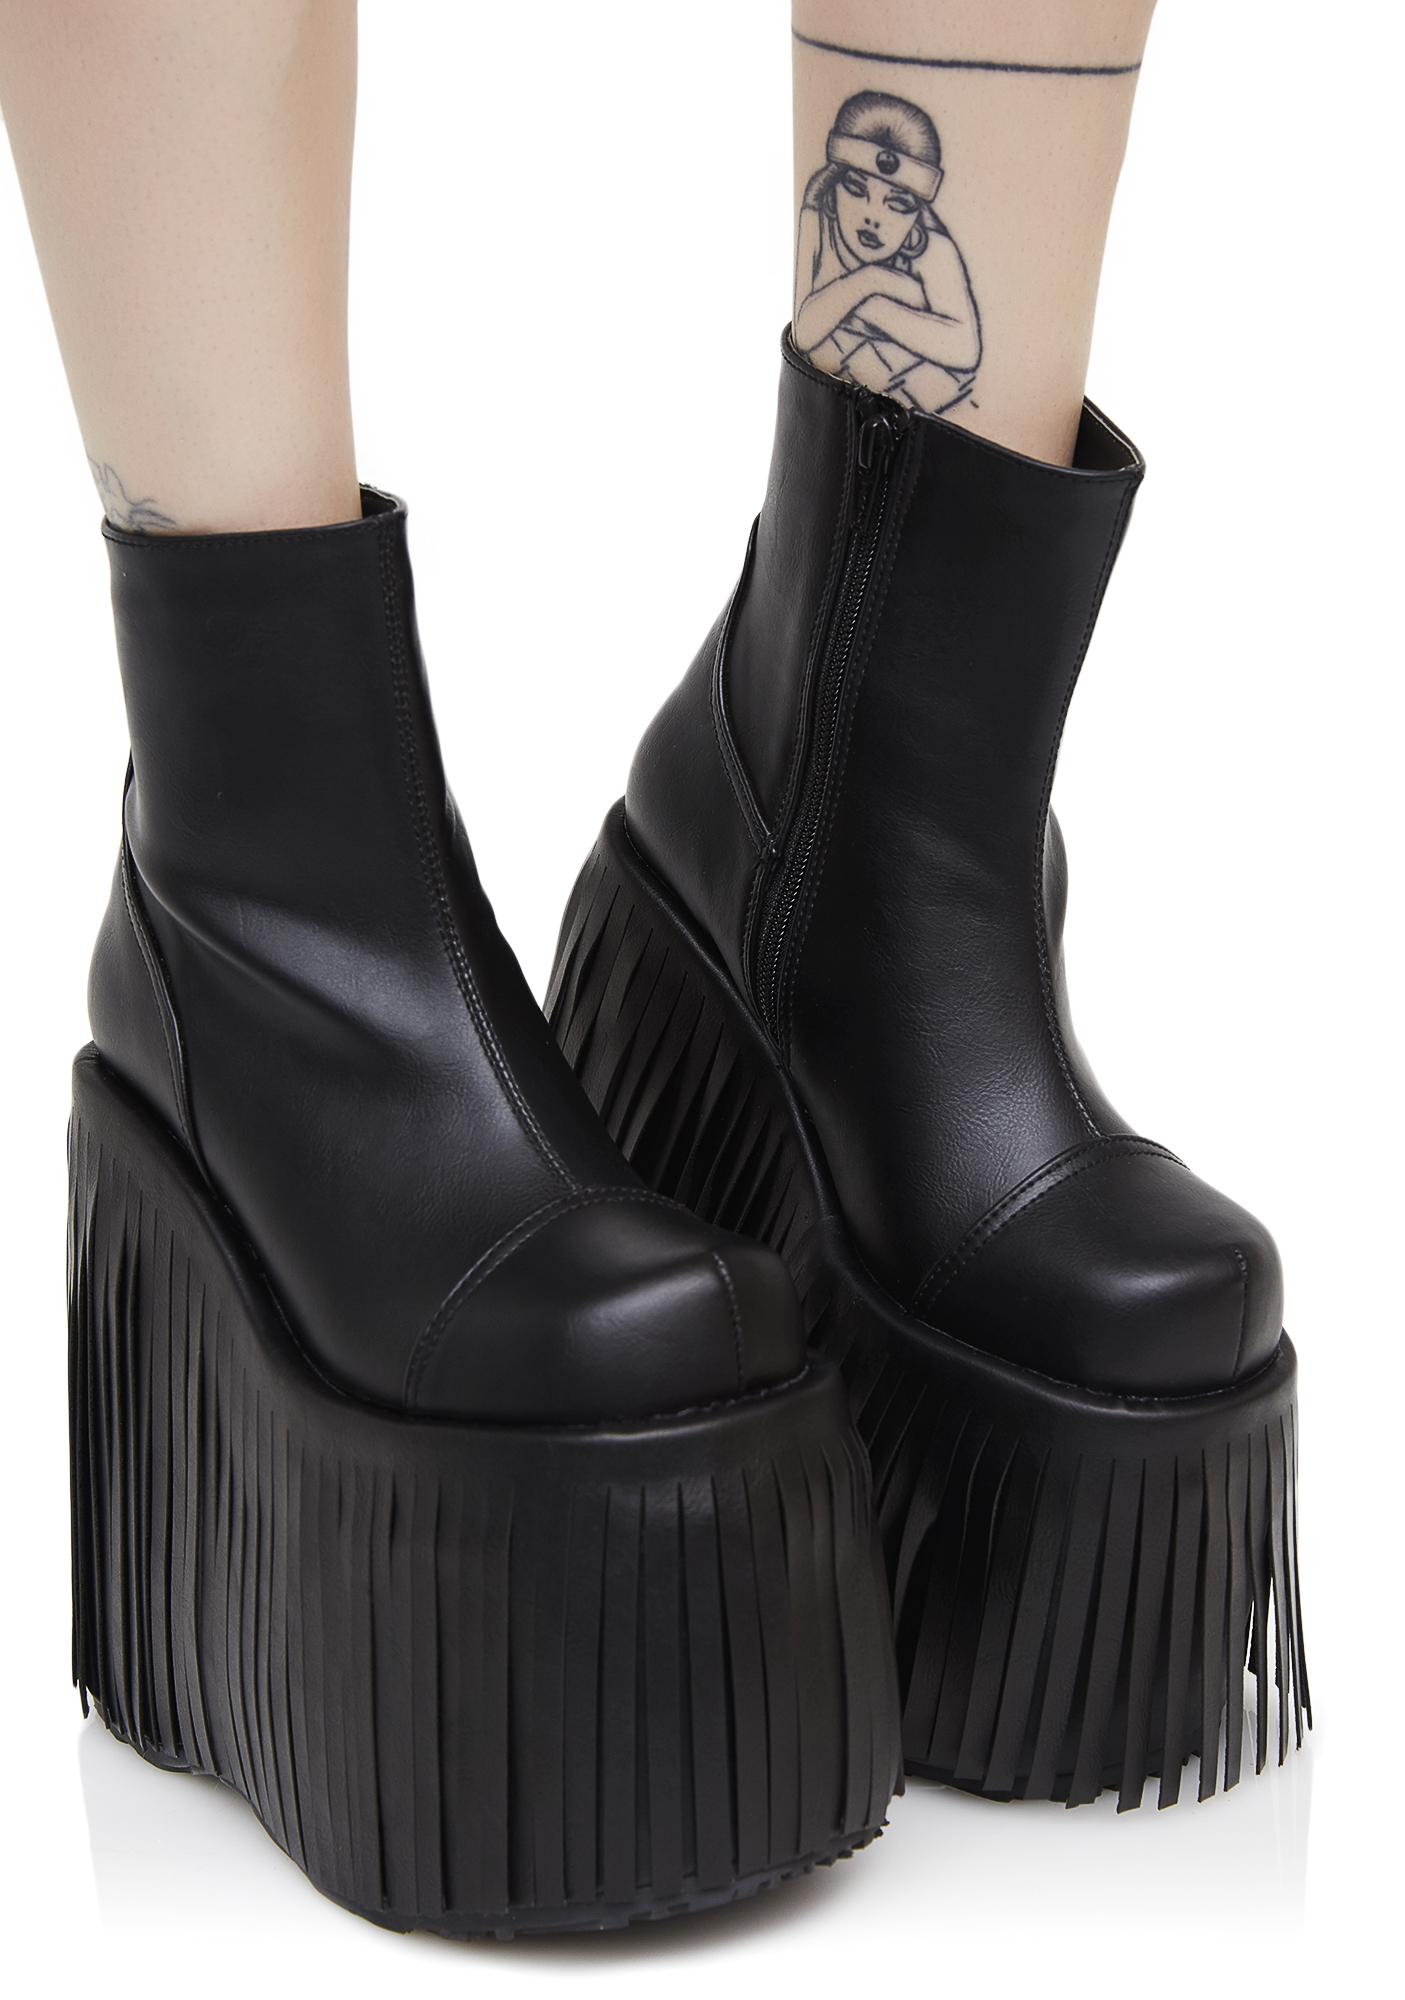 Demonia Dance Kraze Fringed Platform Boots